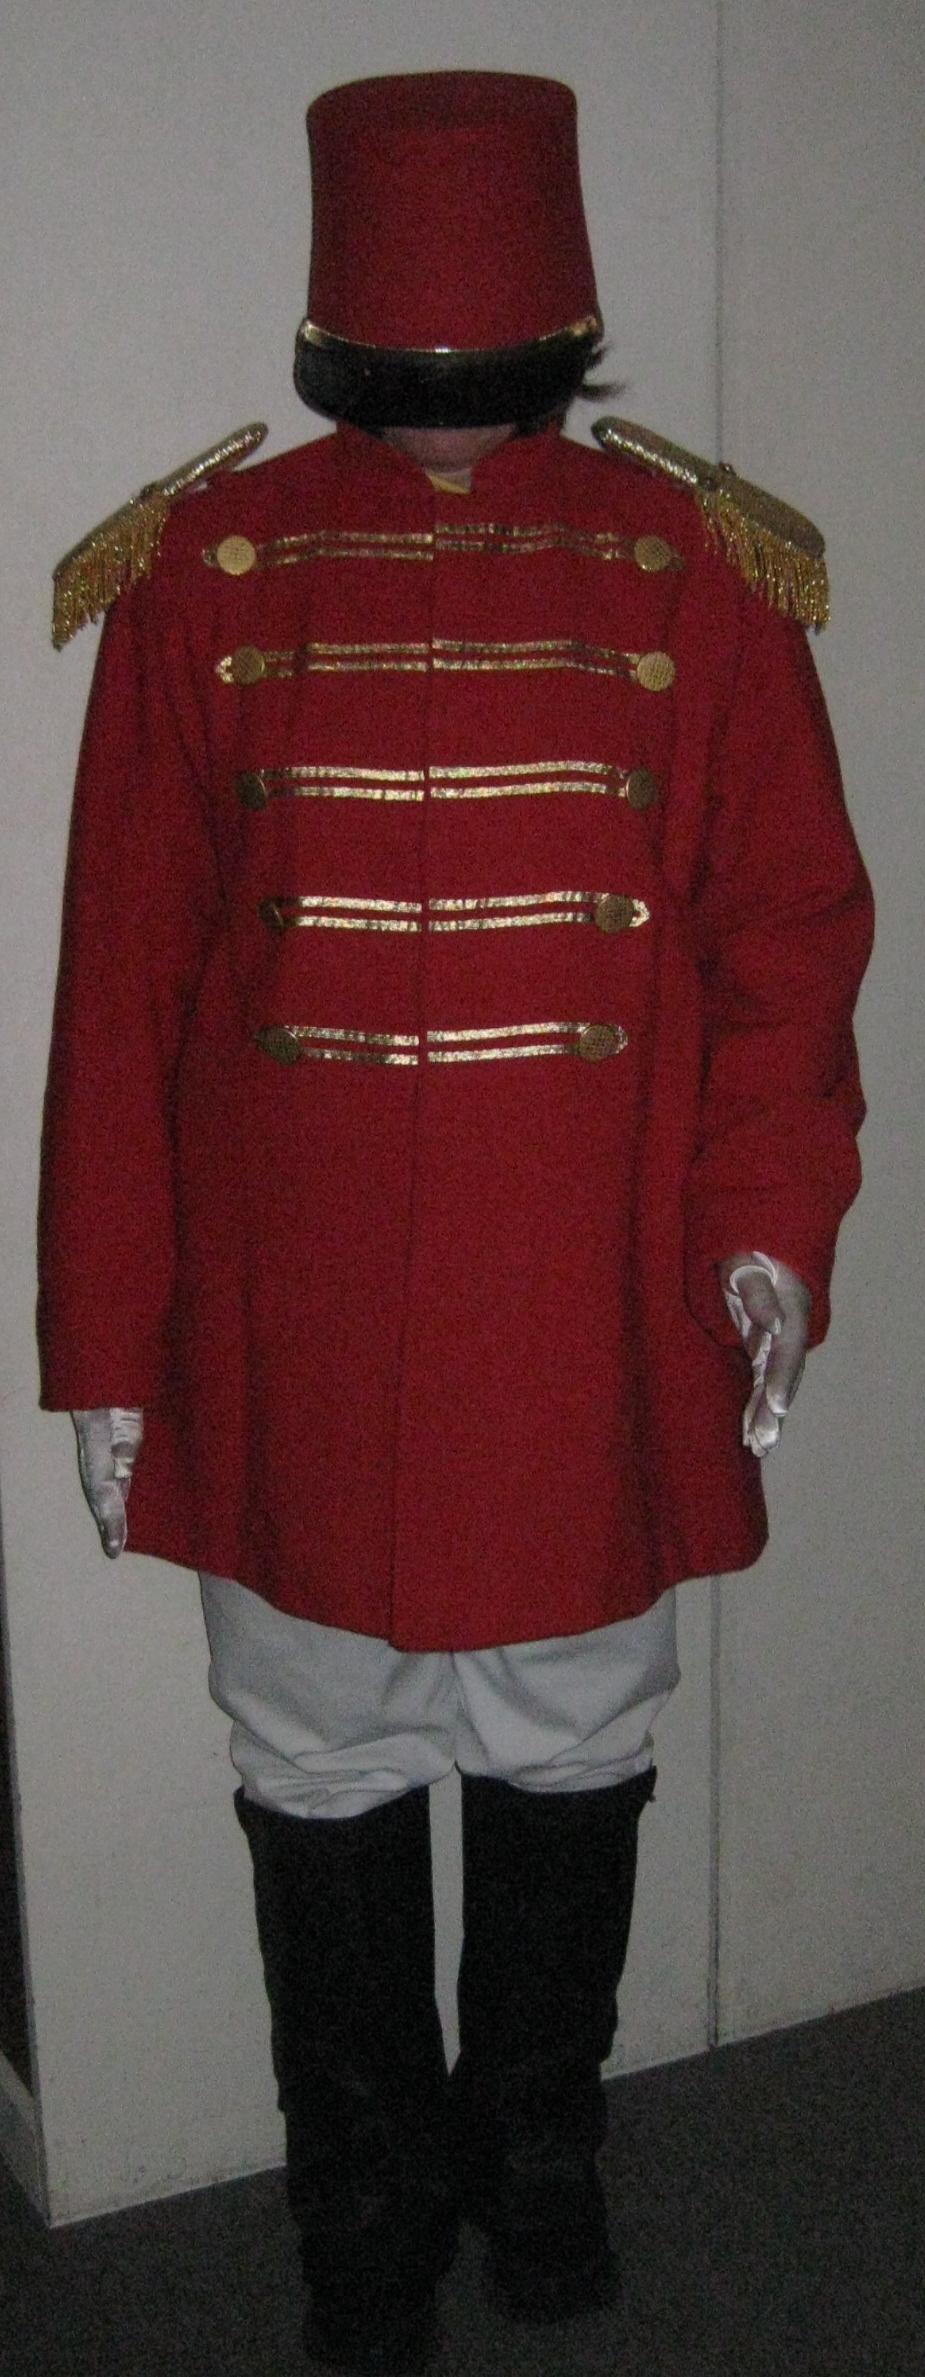 Capital Costumes 047.JPG